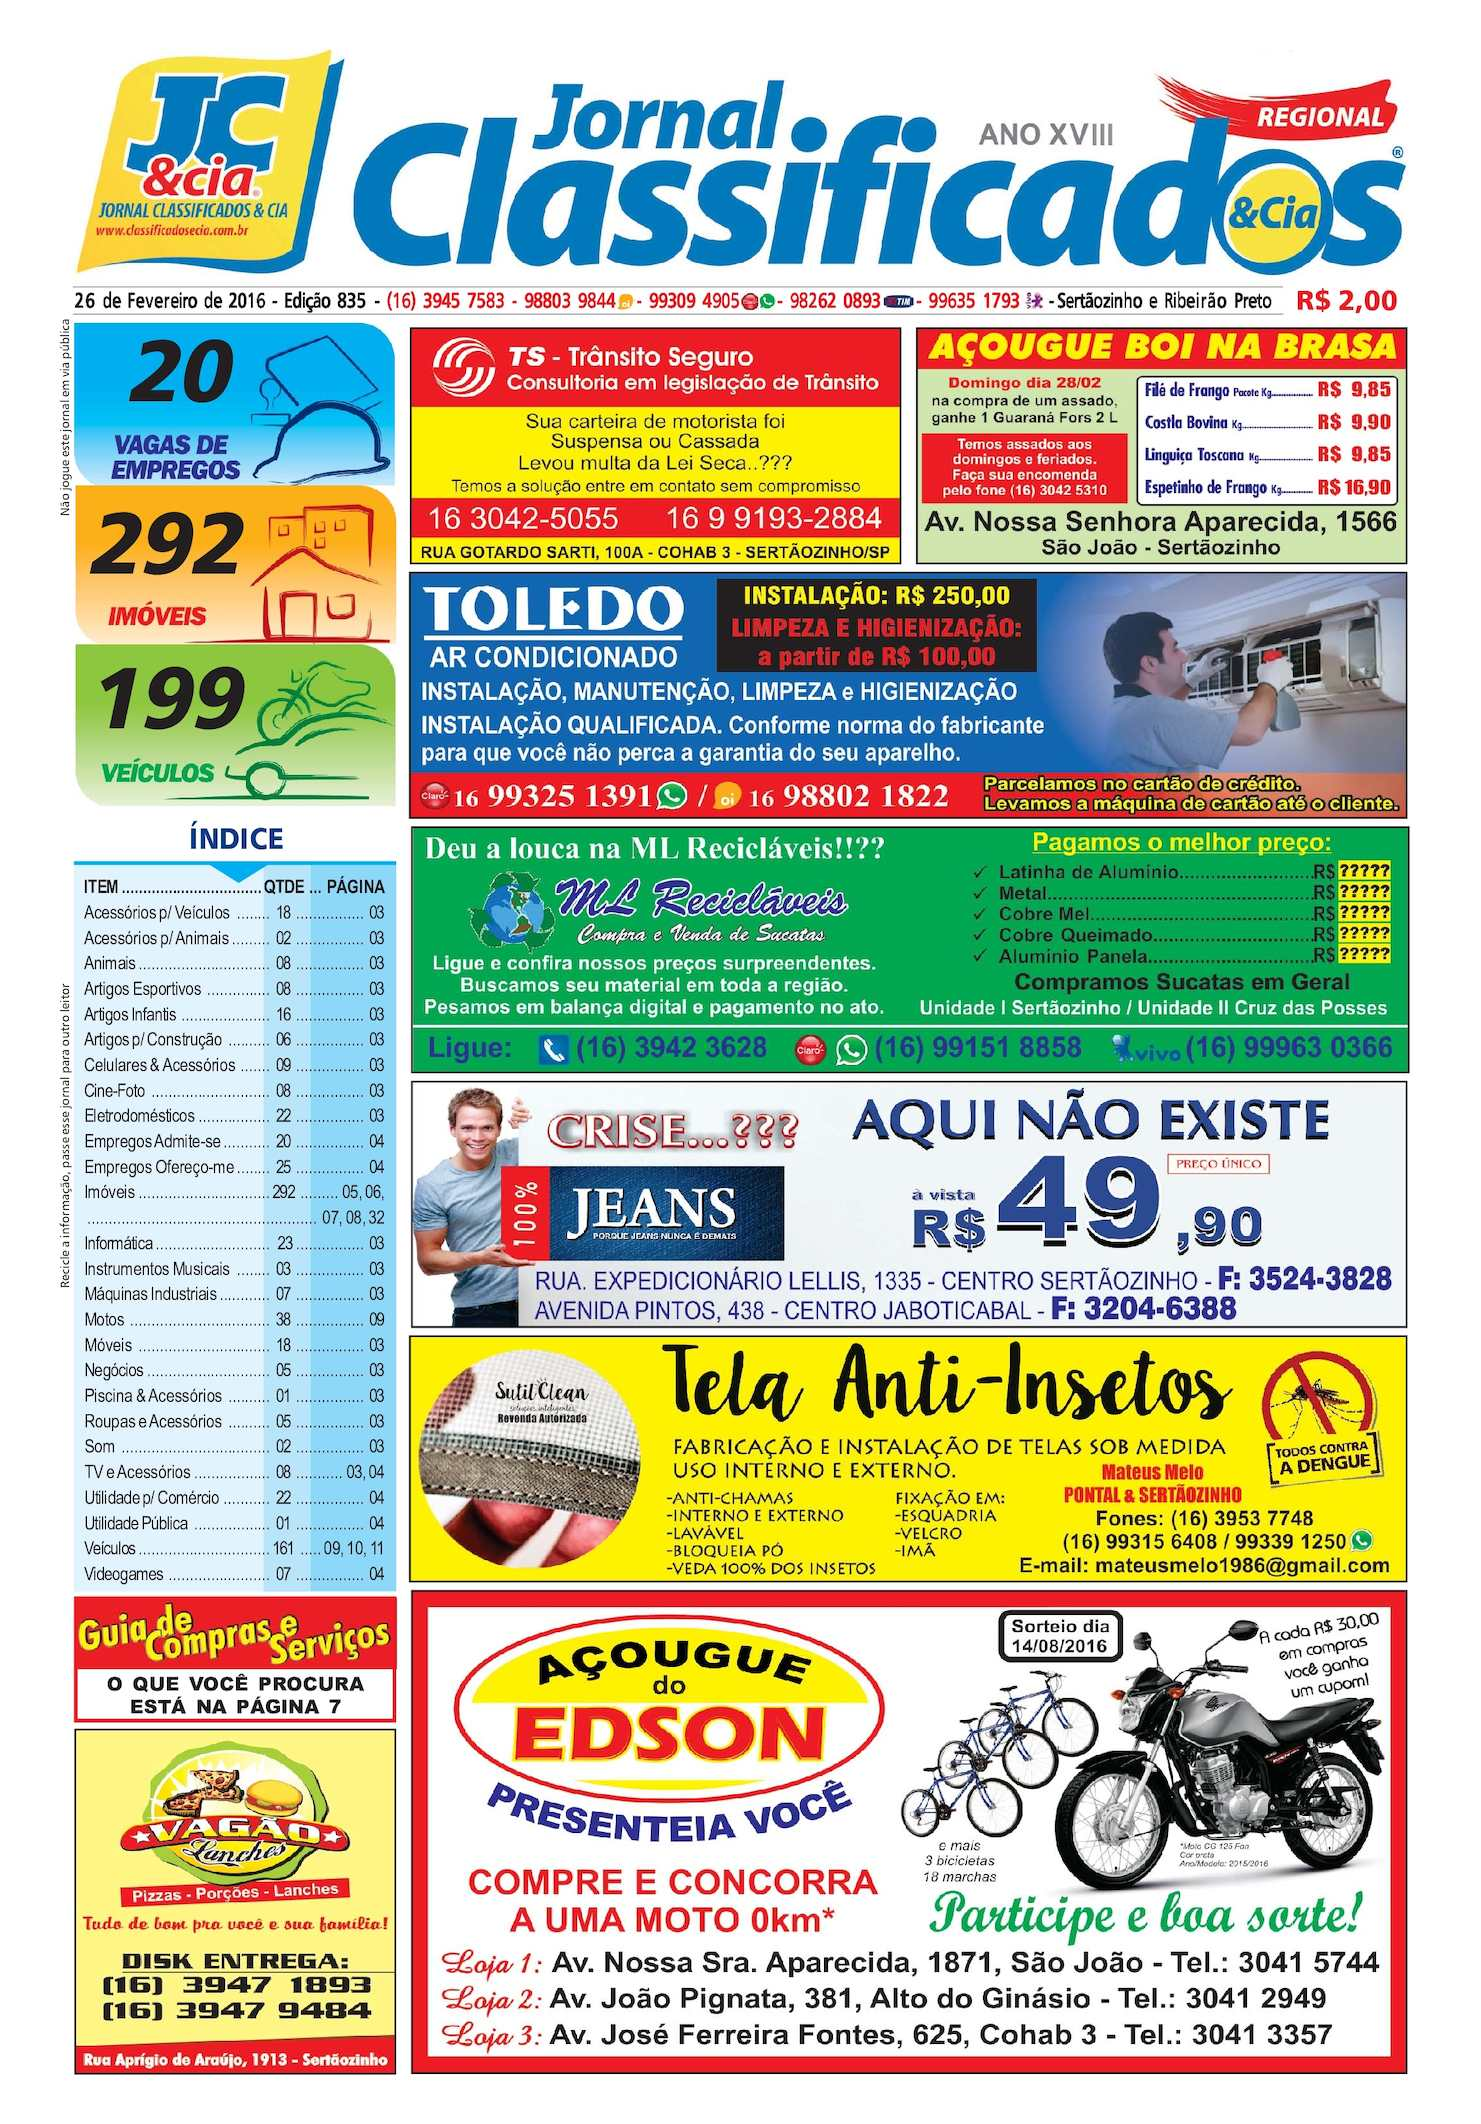 98c744ed67e Calaméo - Regional 835